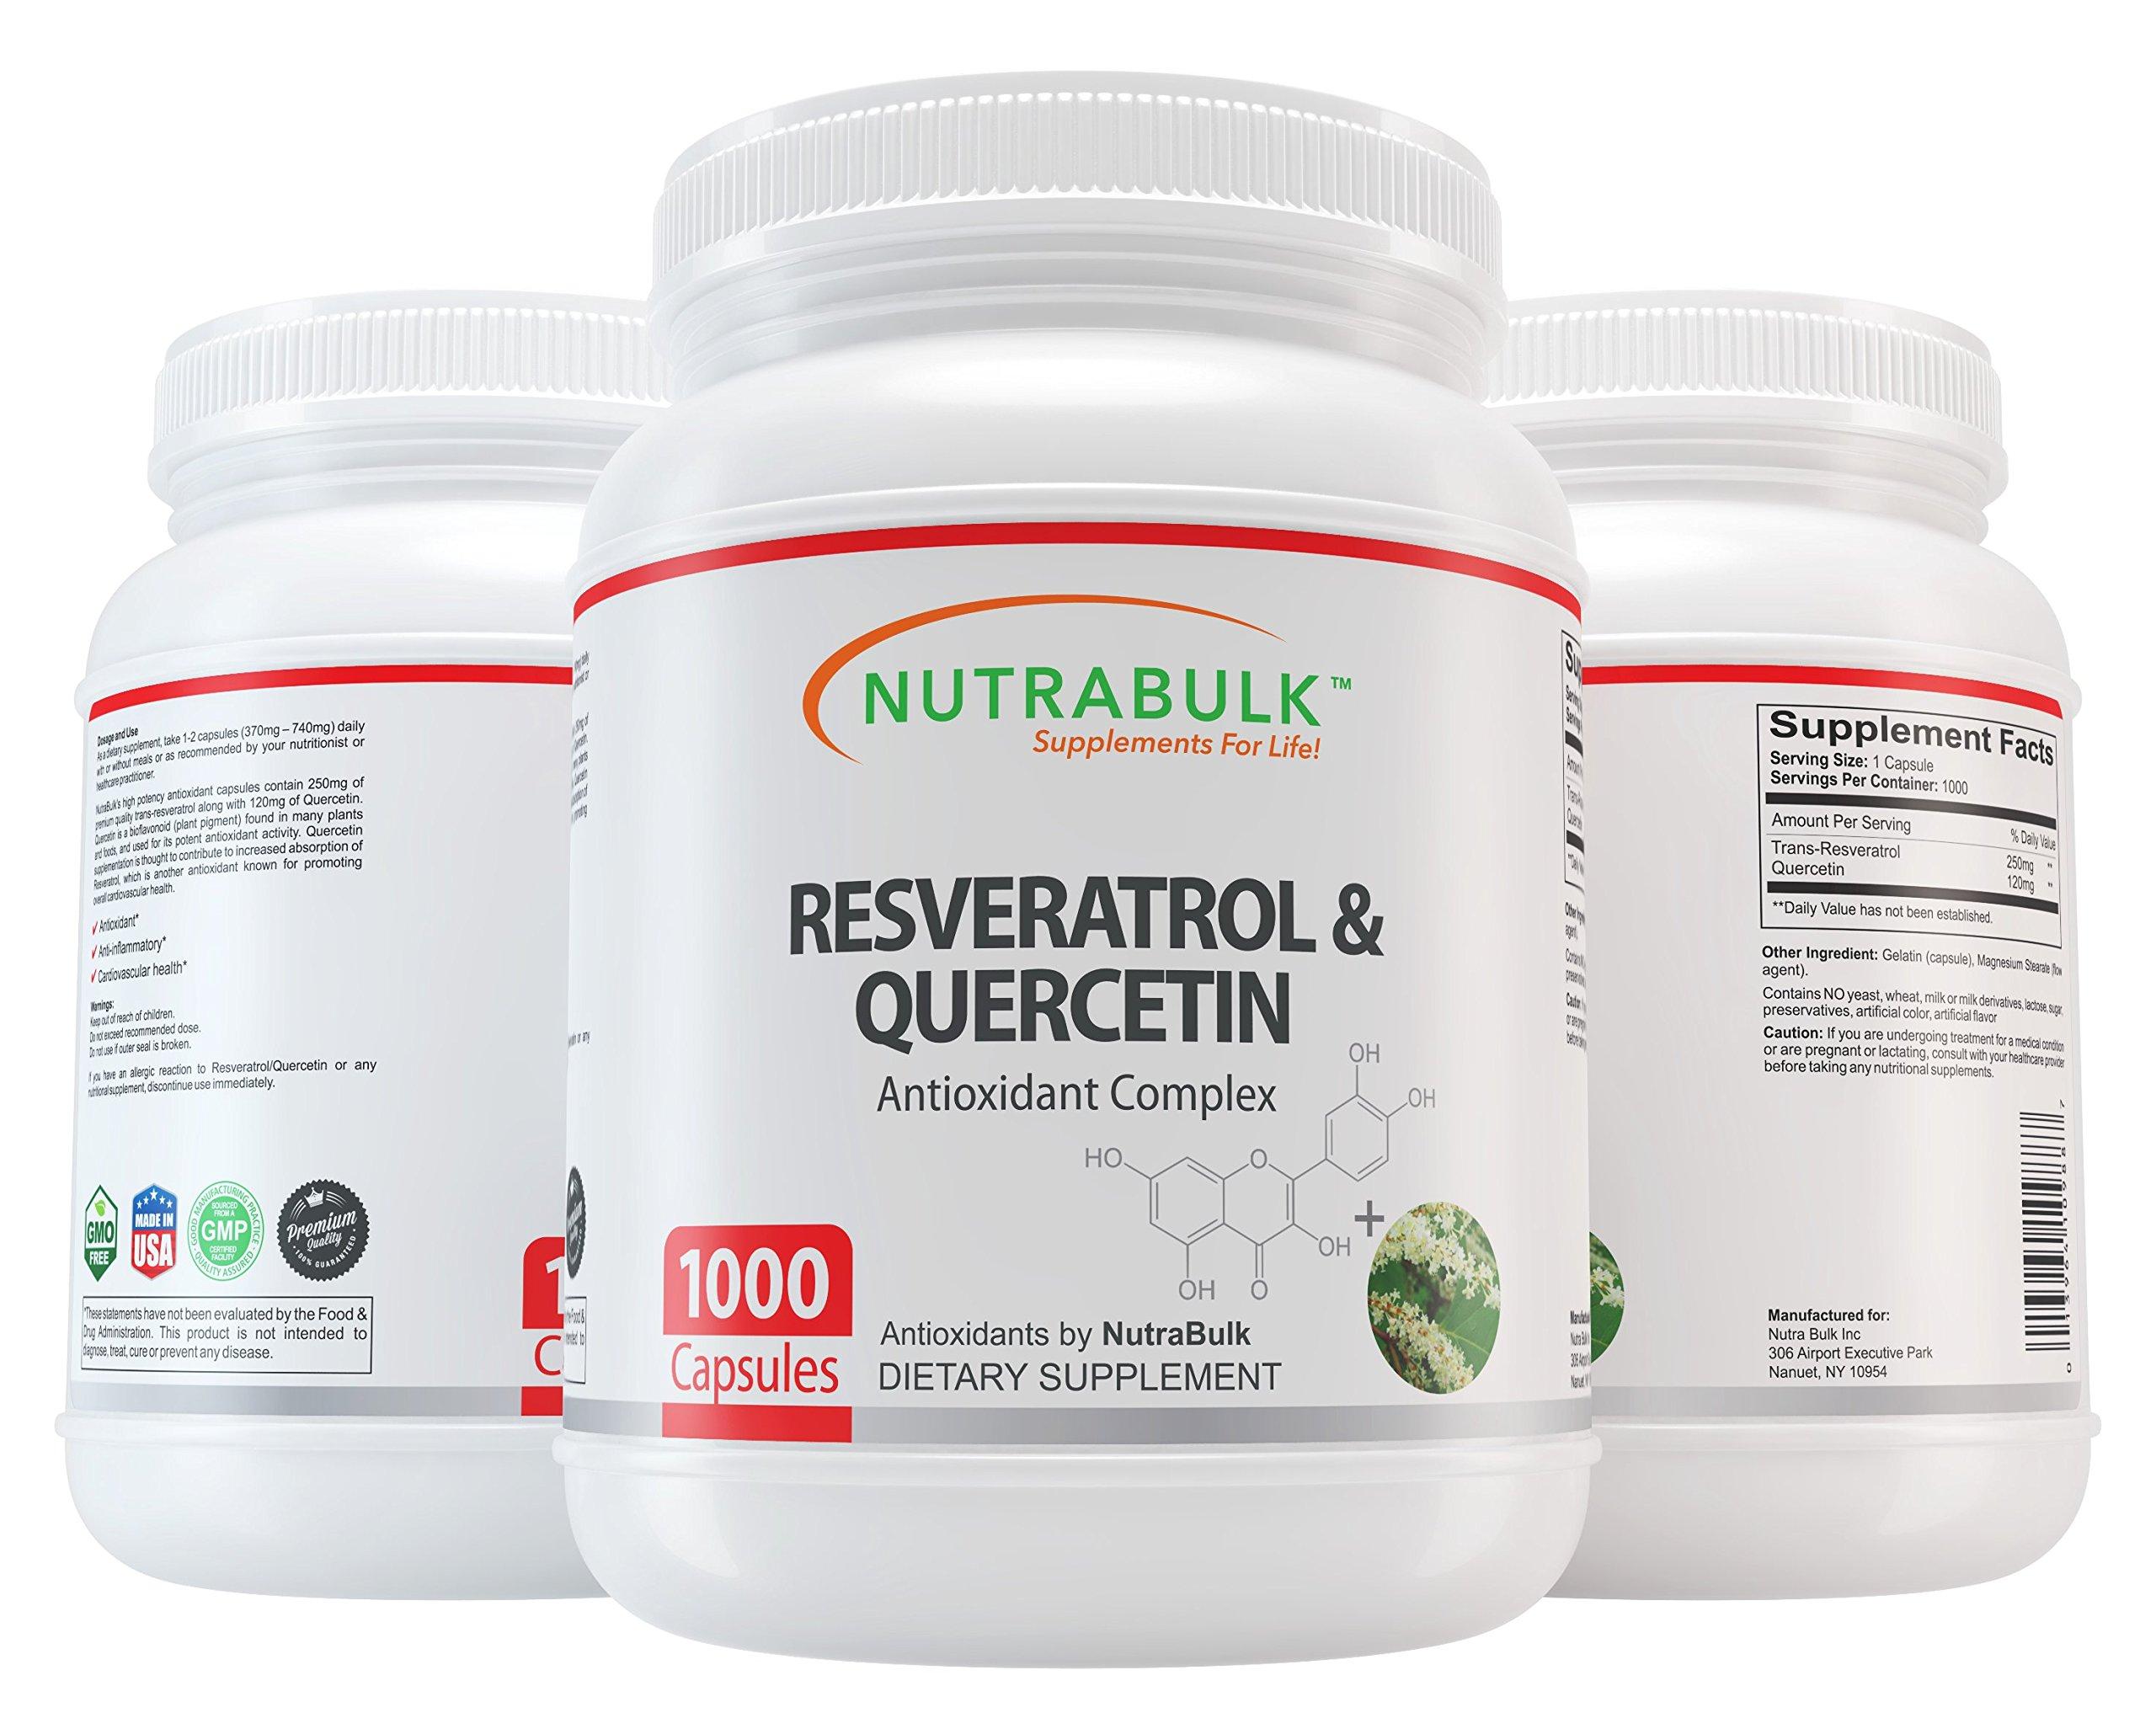 NutraBulk Resveratrol 250mg / Quercetin 120mg Capusules 1000 Count